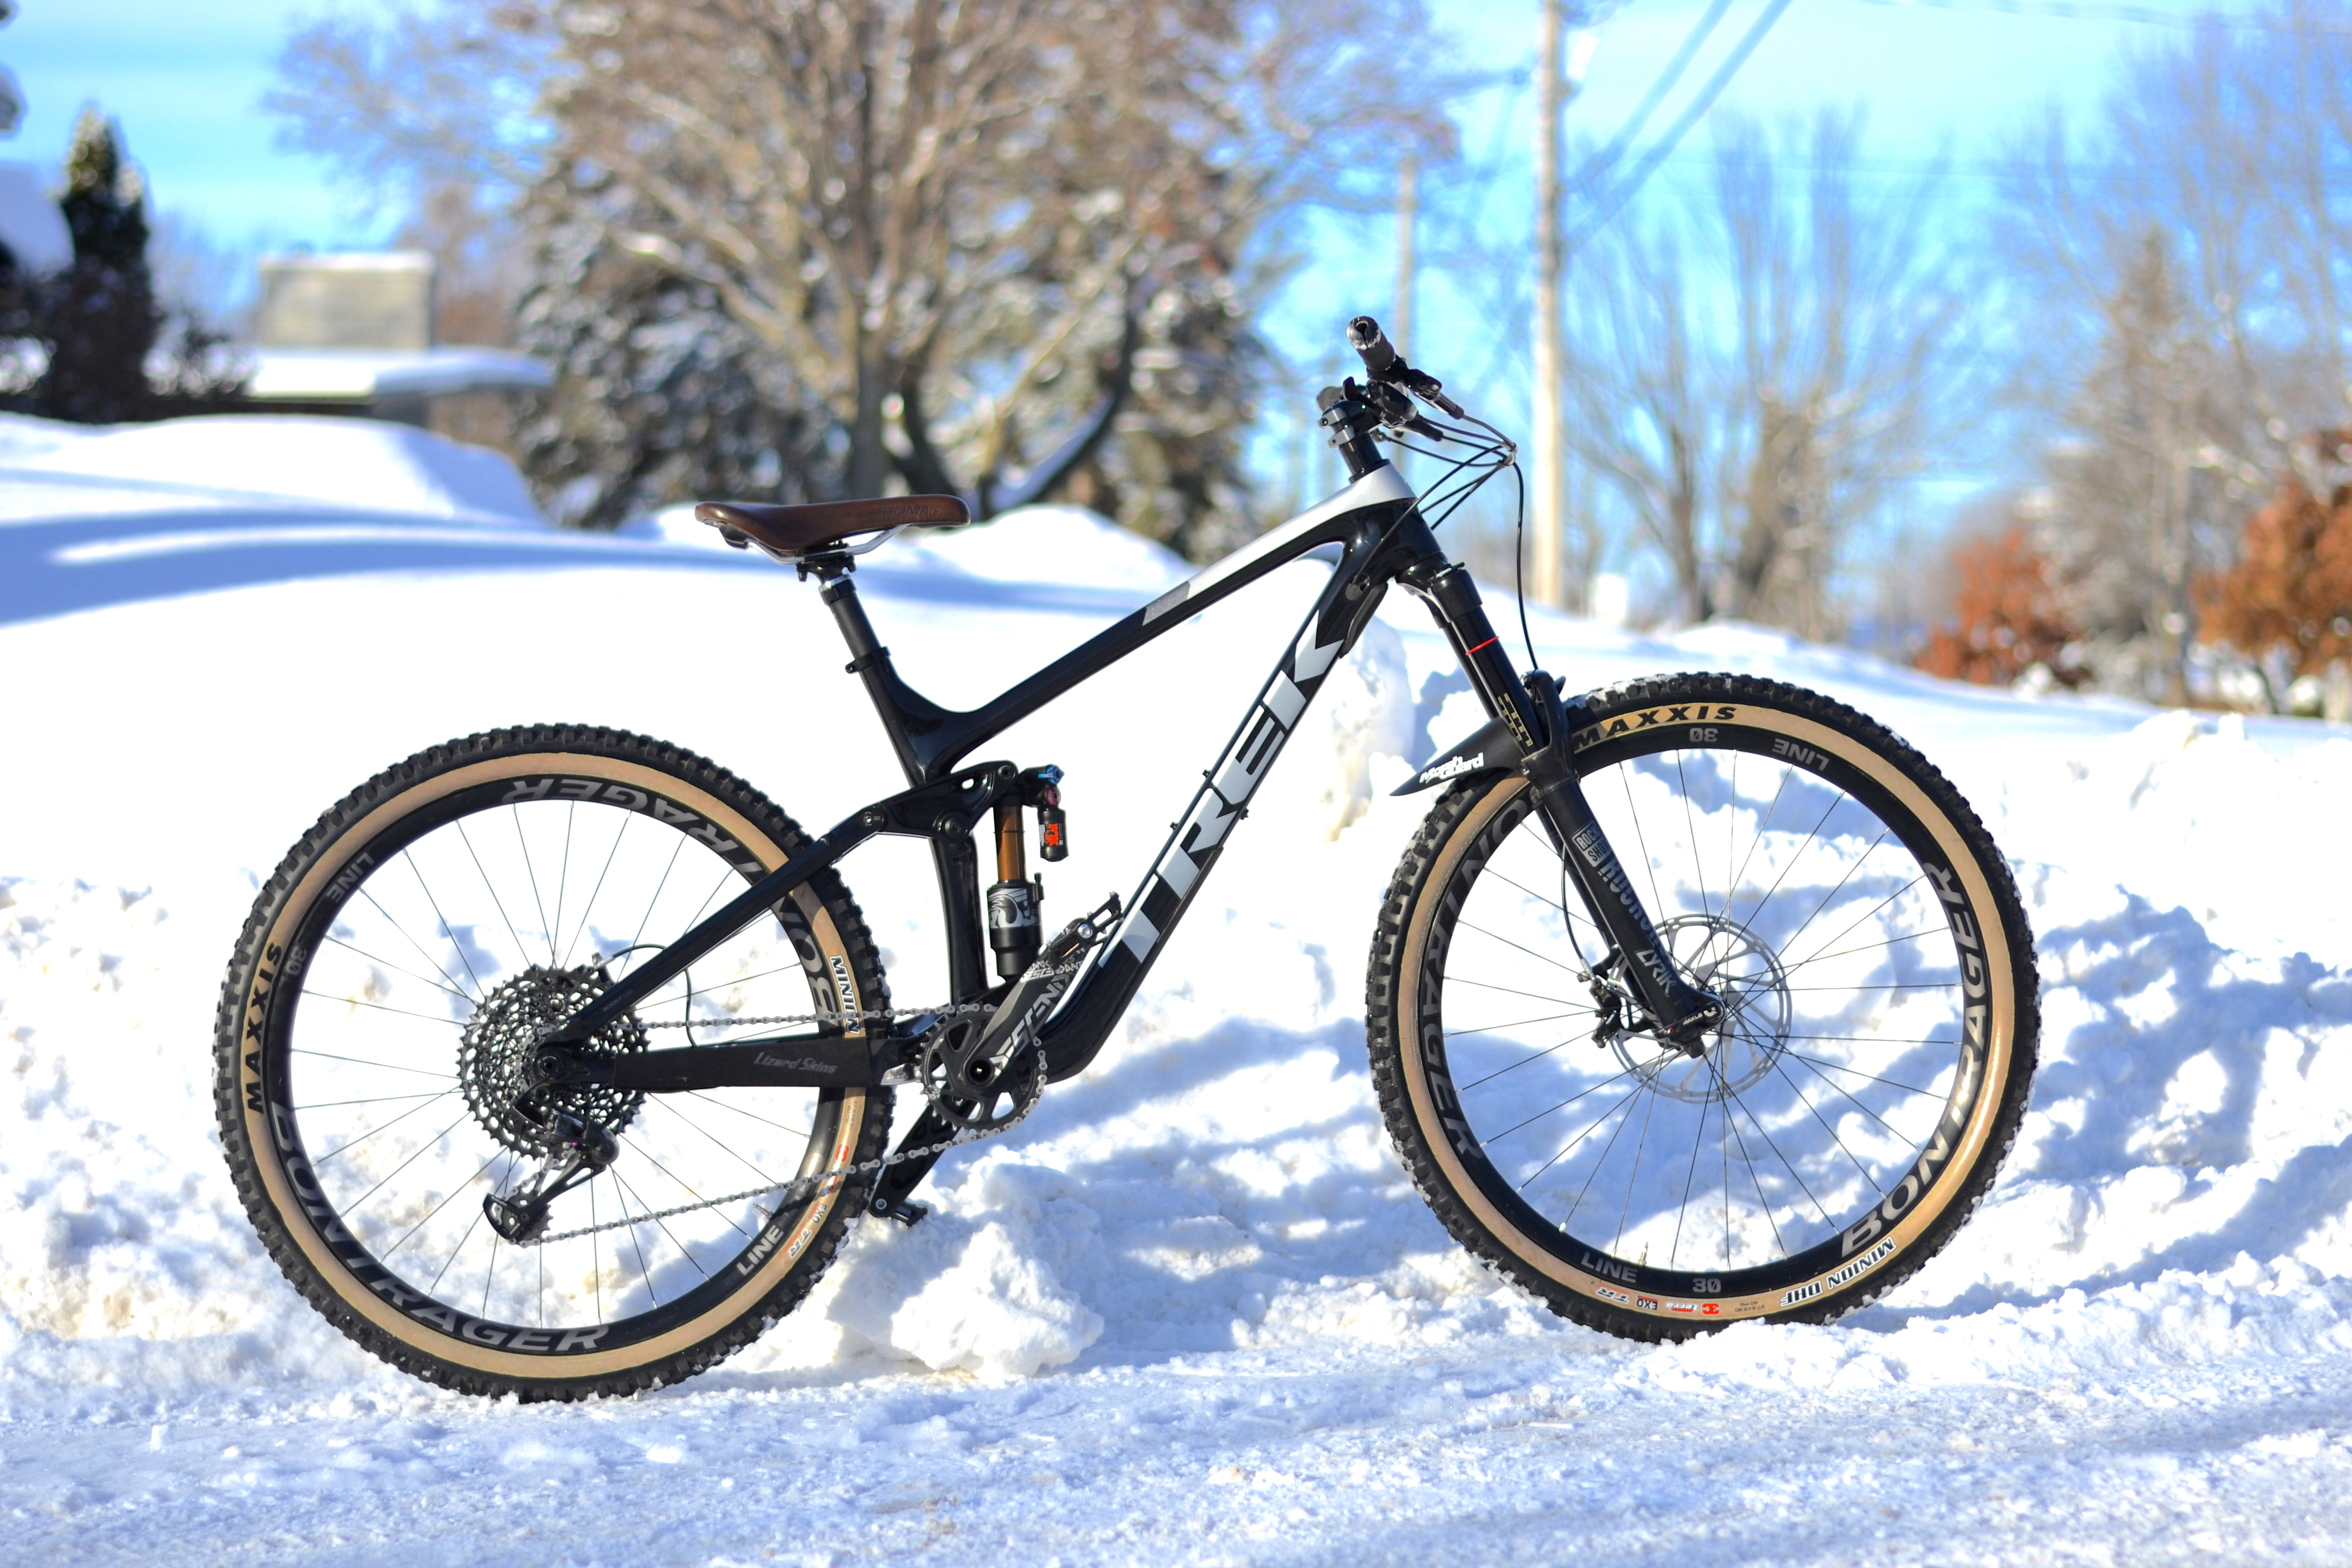 2018 Custom Trek remedy 9.8 - loiic33's Bike Check - Vital MTB